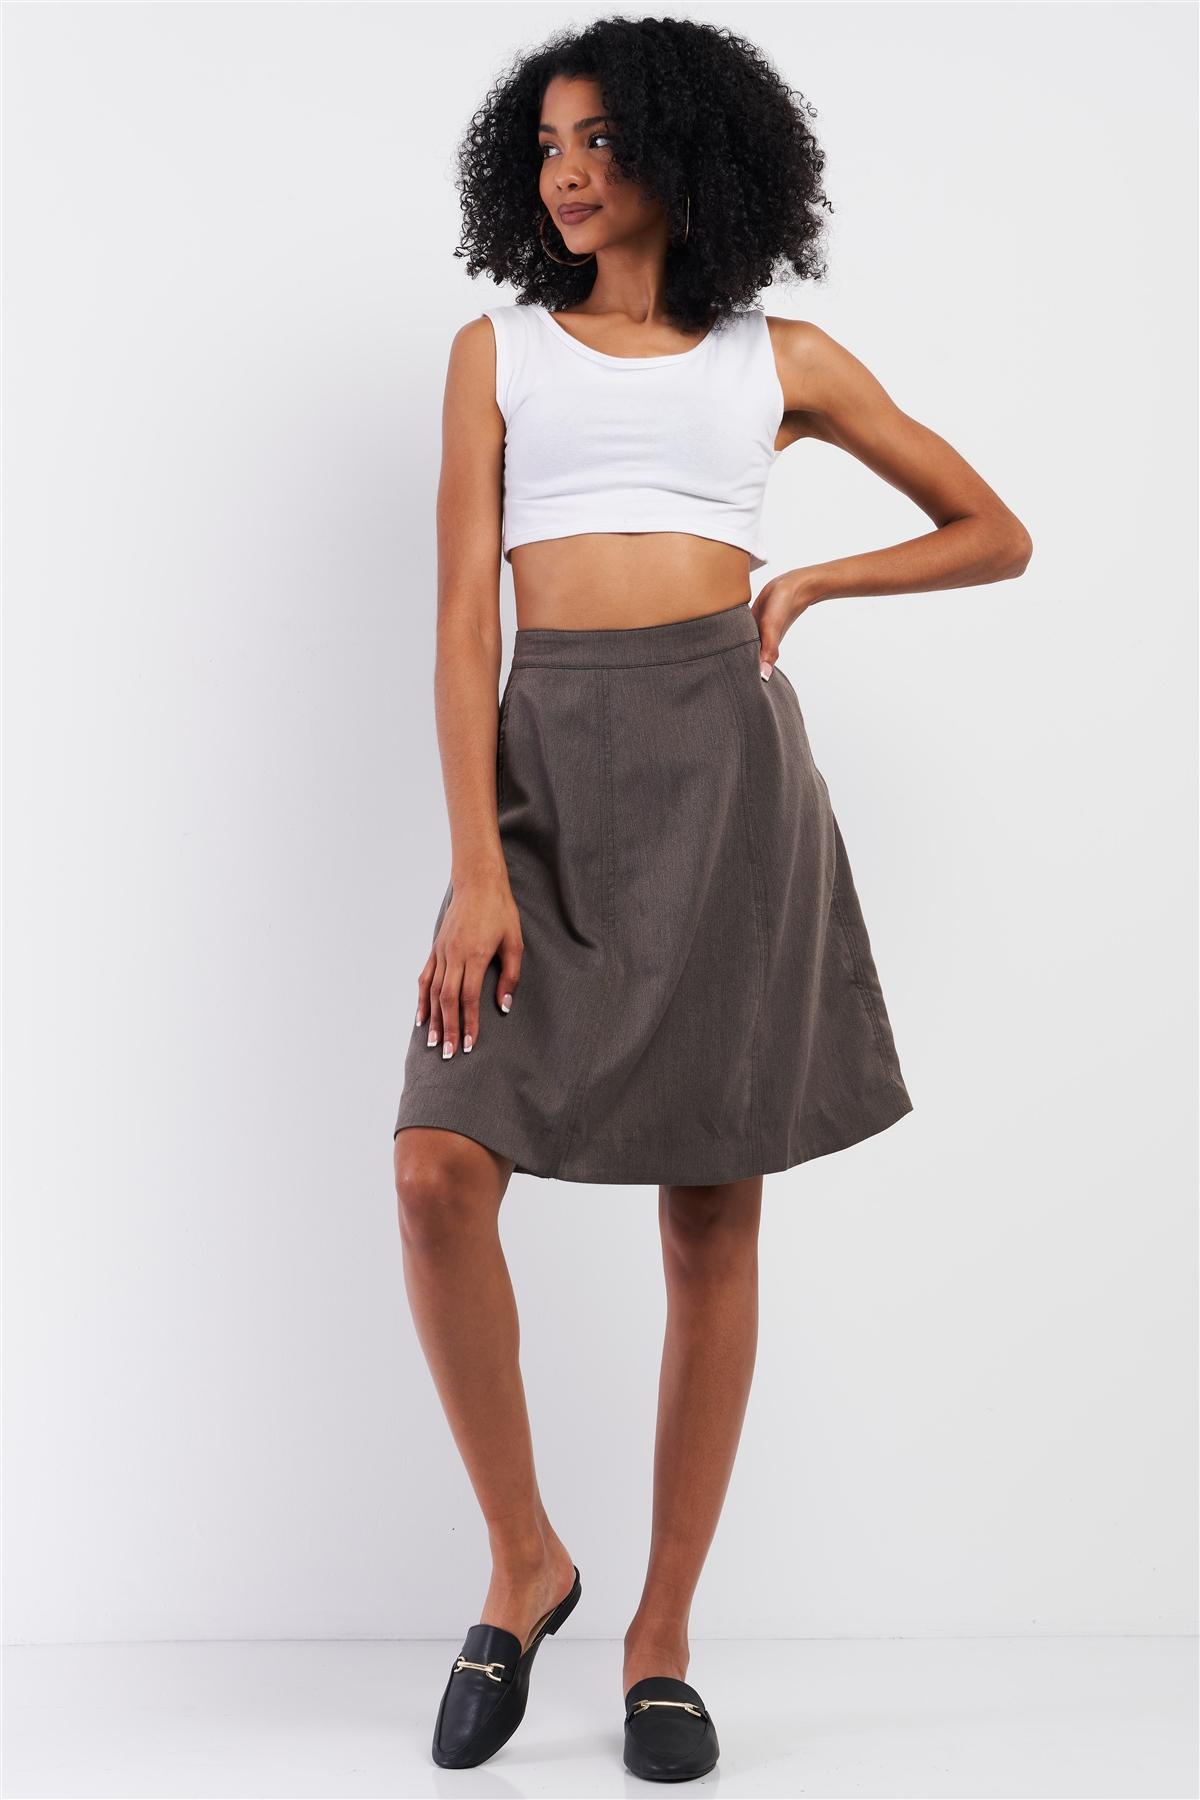 Grey Knee Length Midi Skirt With Side Pockets 2 2 2